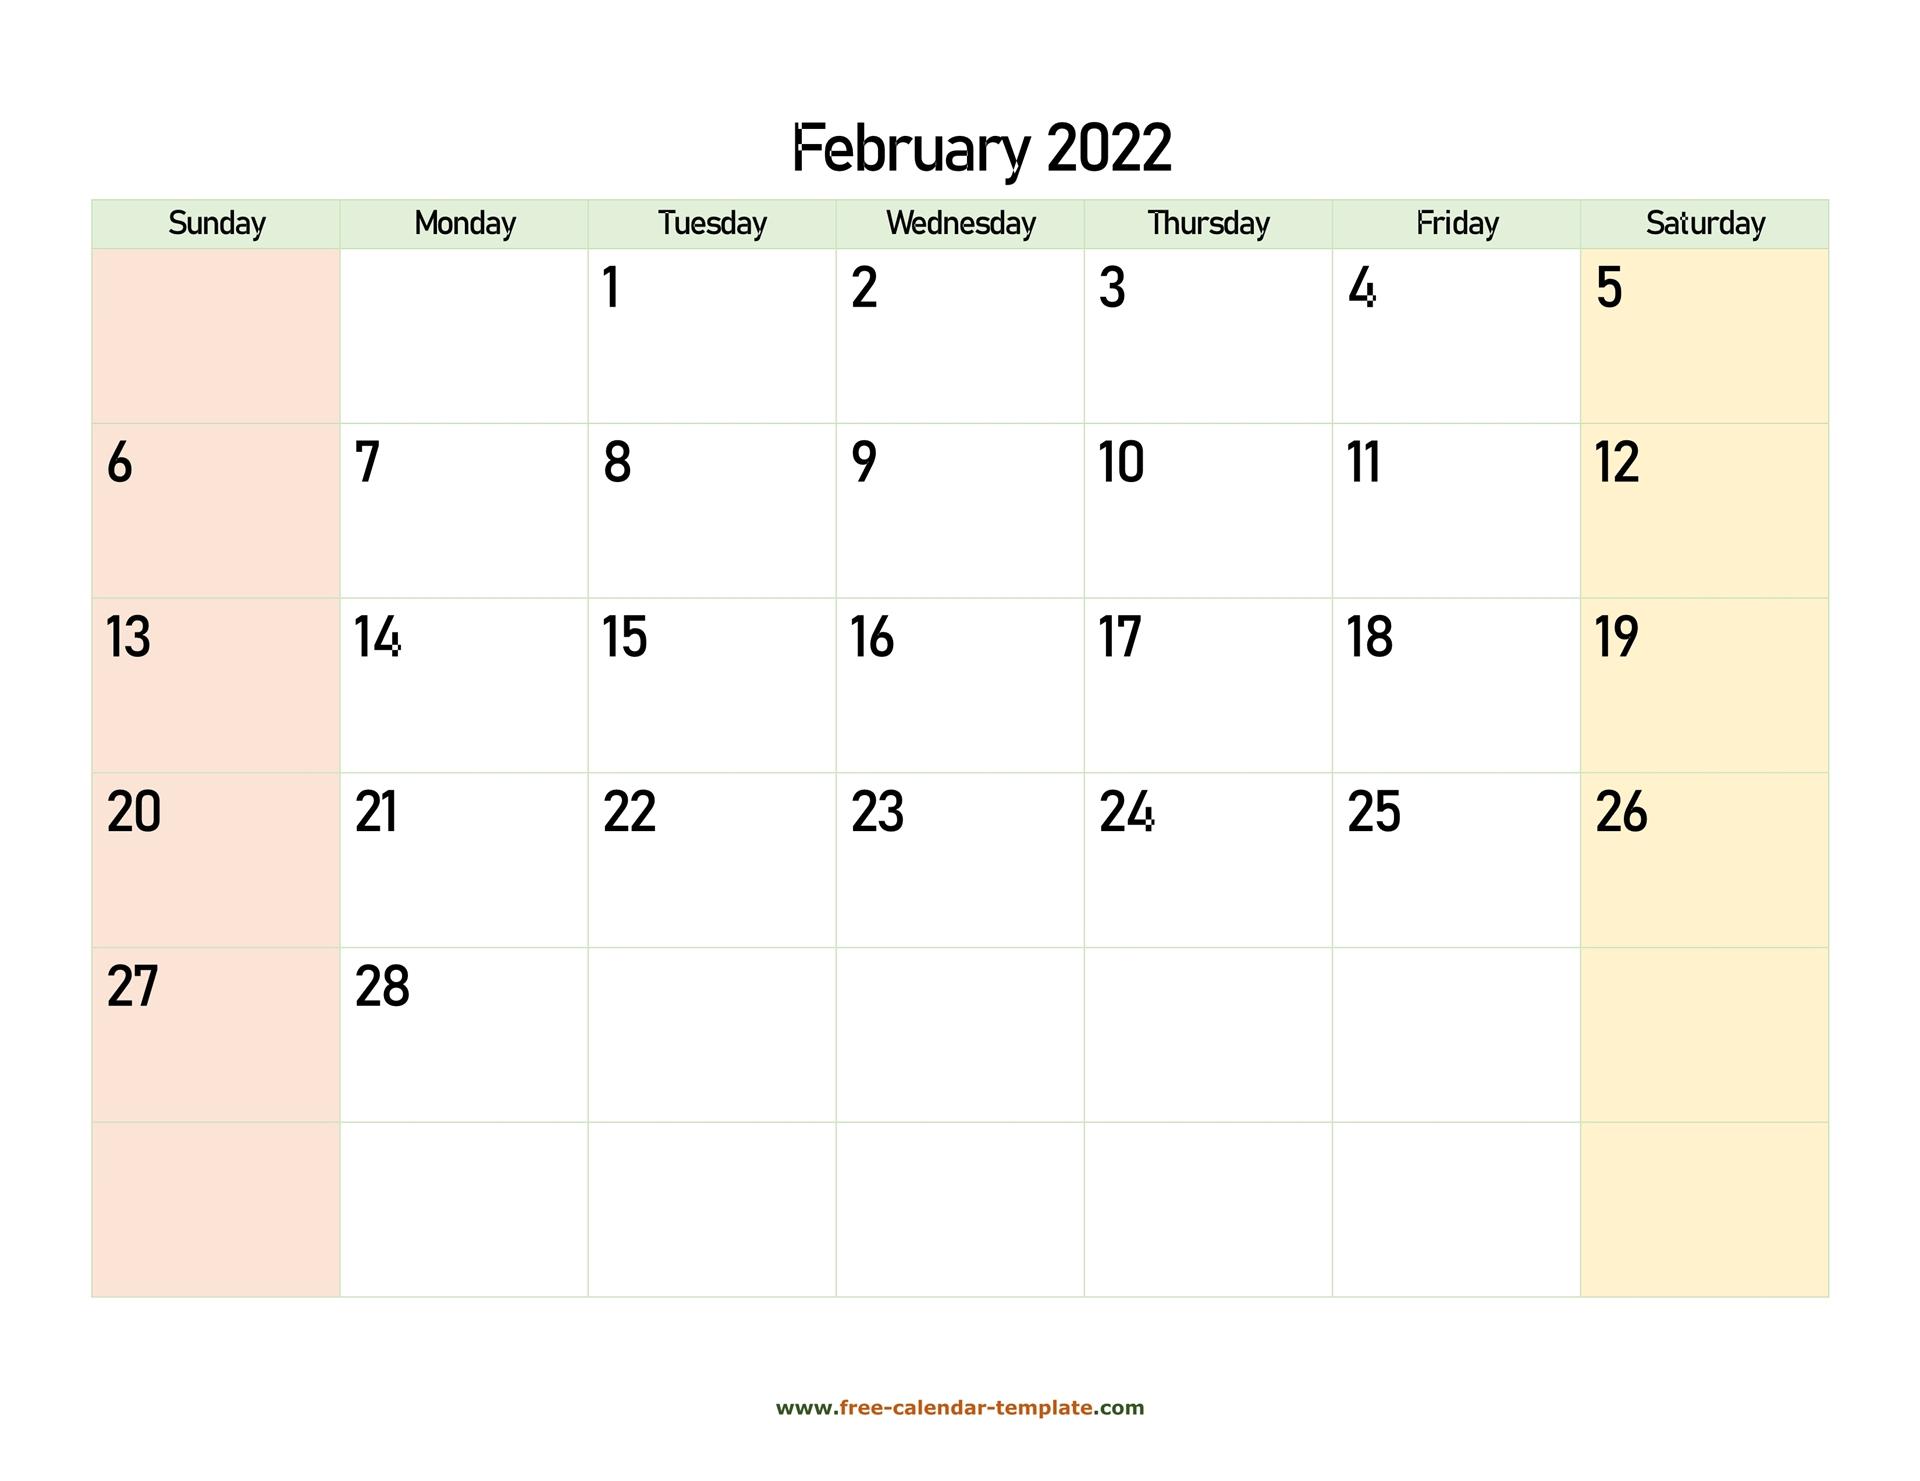 February 2022 Free Calendar Tempplate